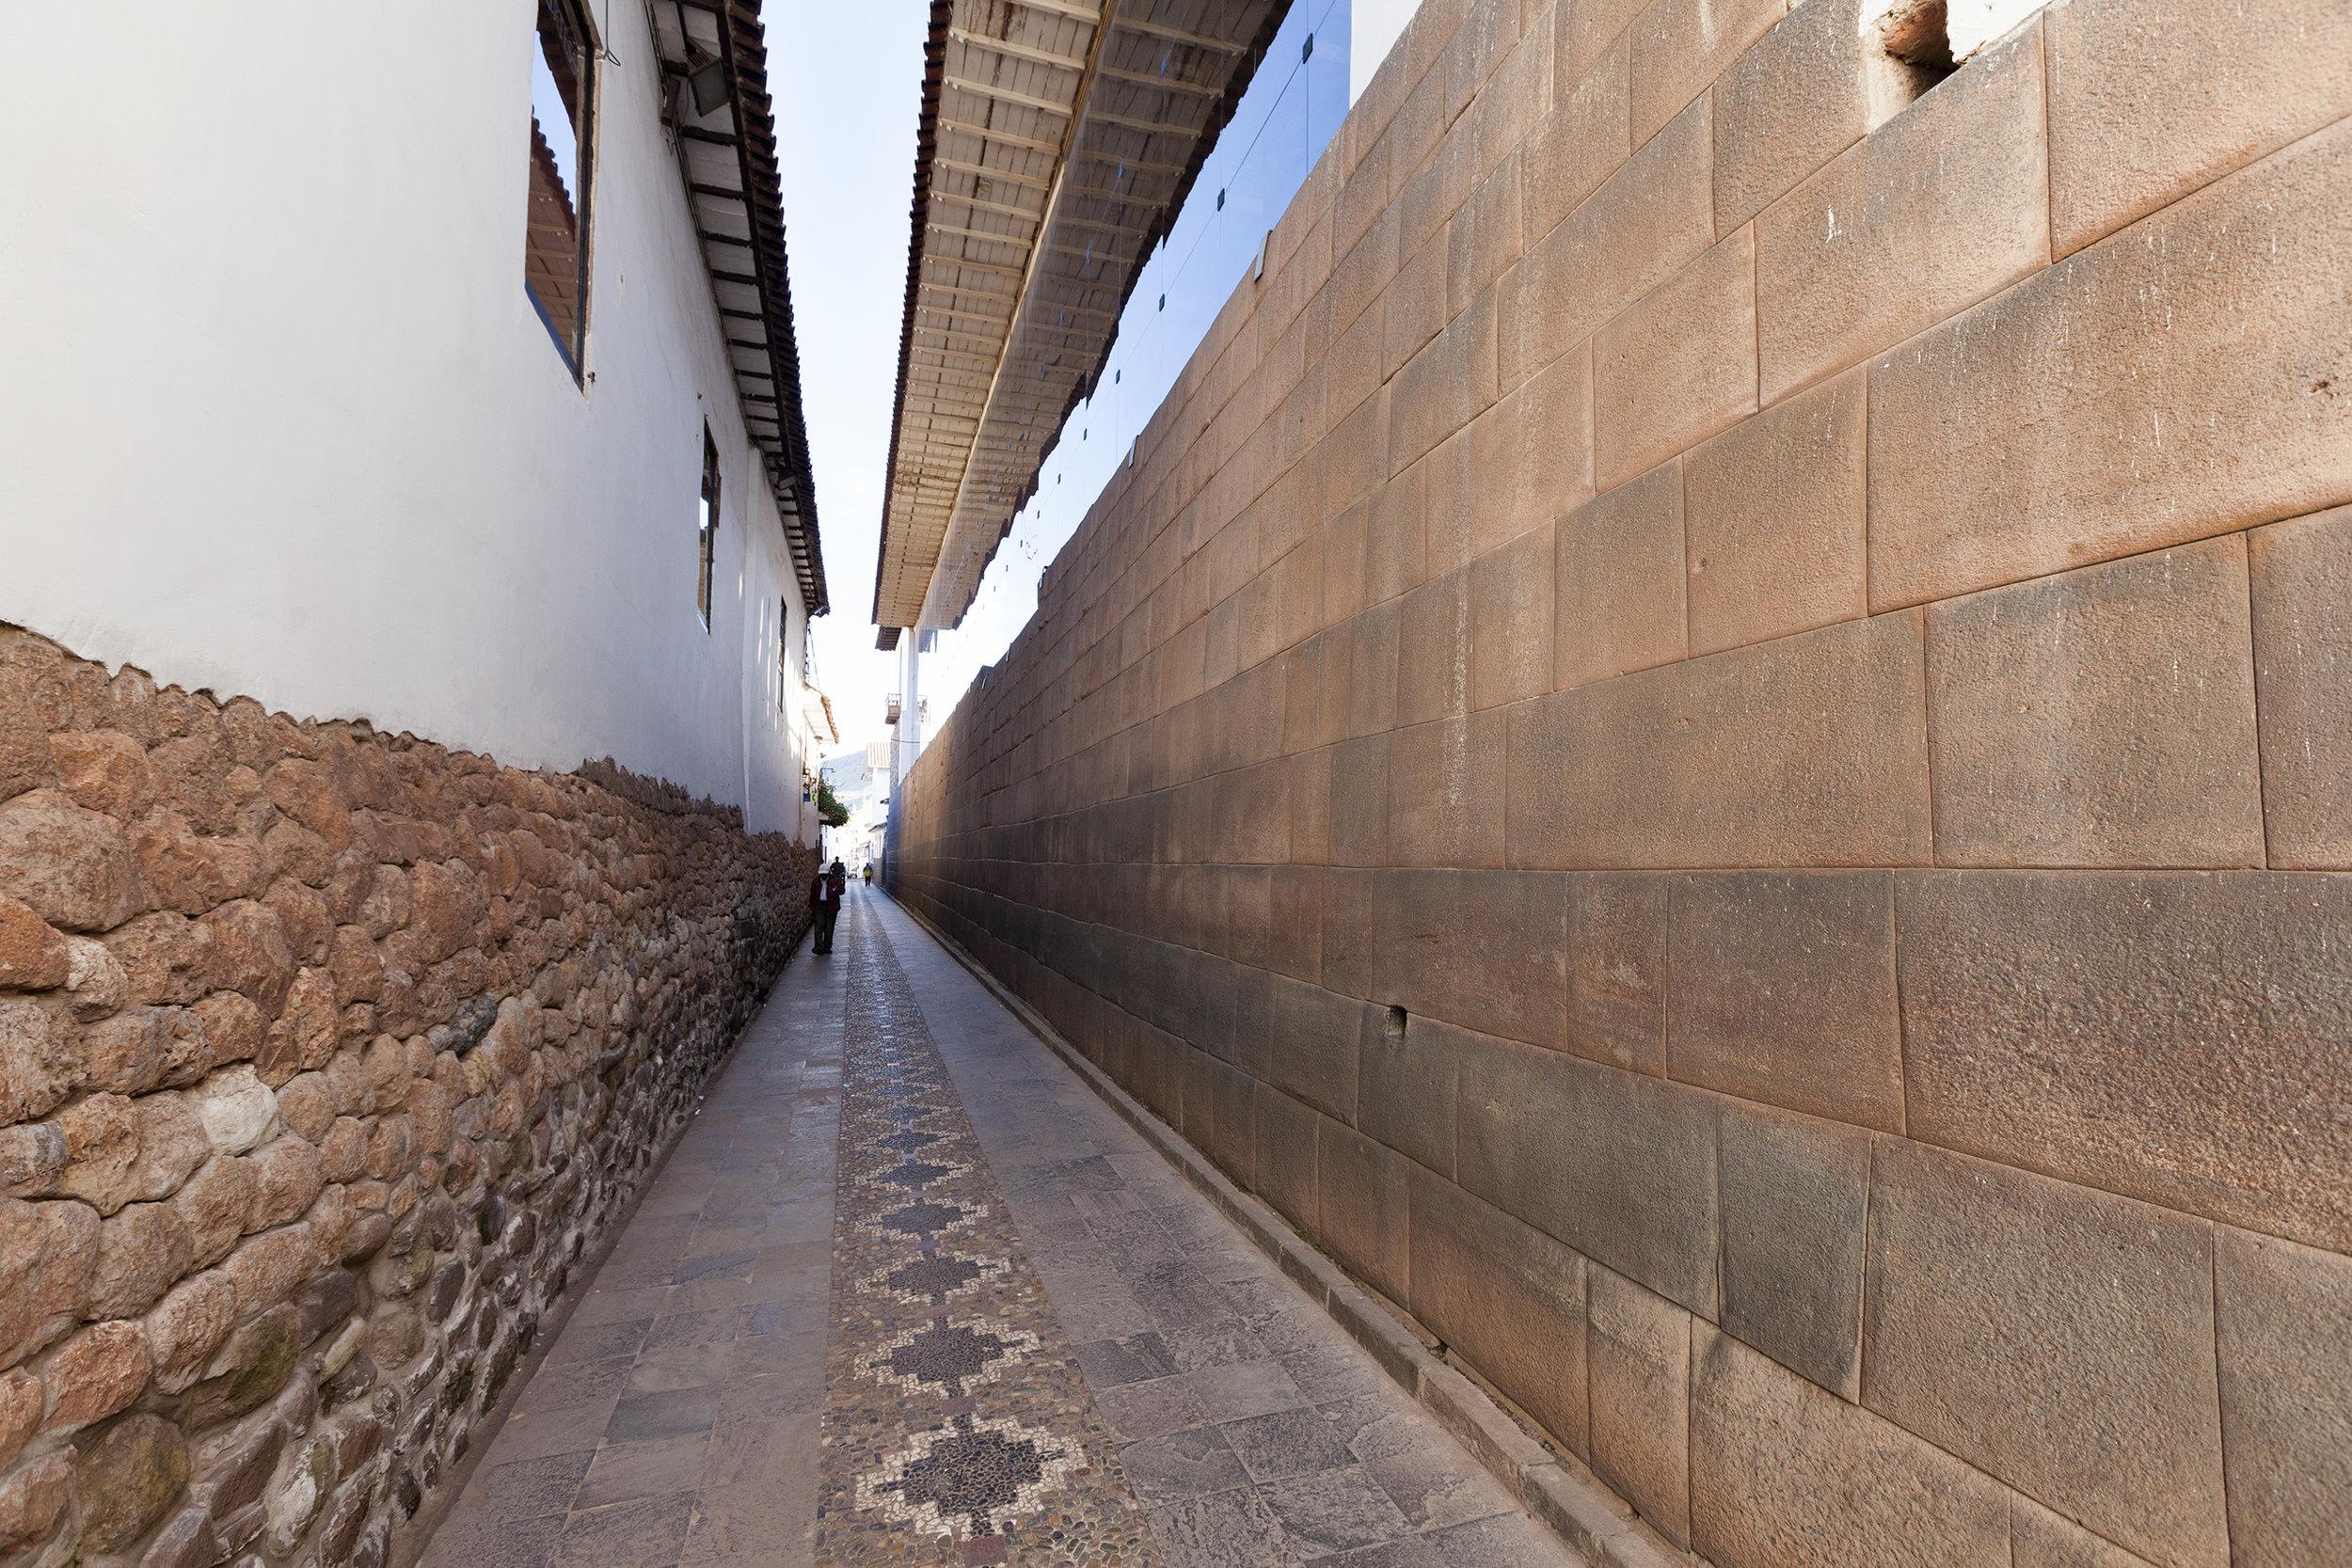 Spanish on left, Incan on right